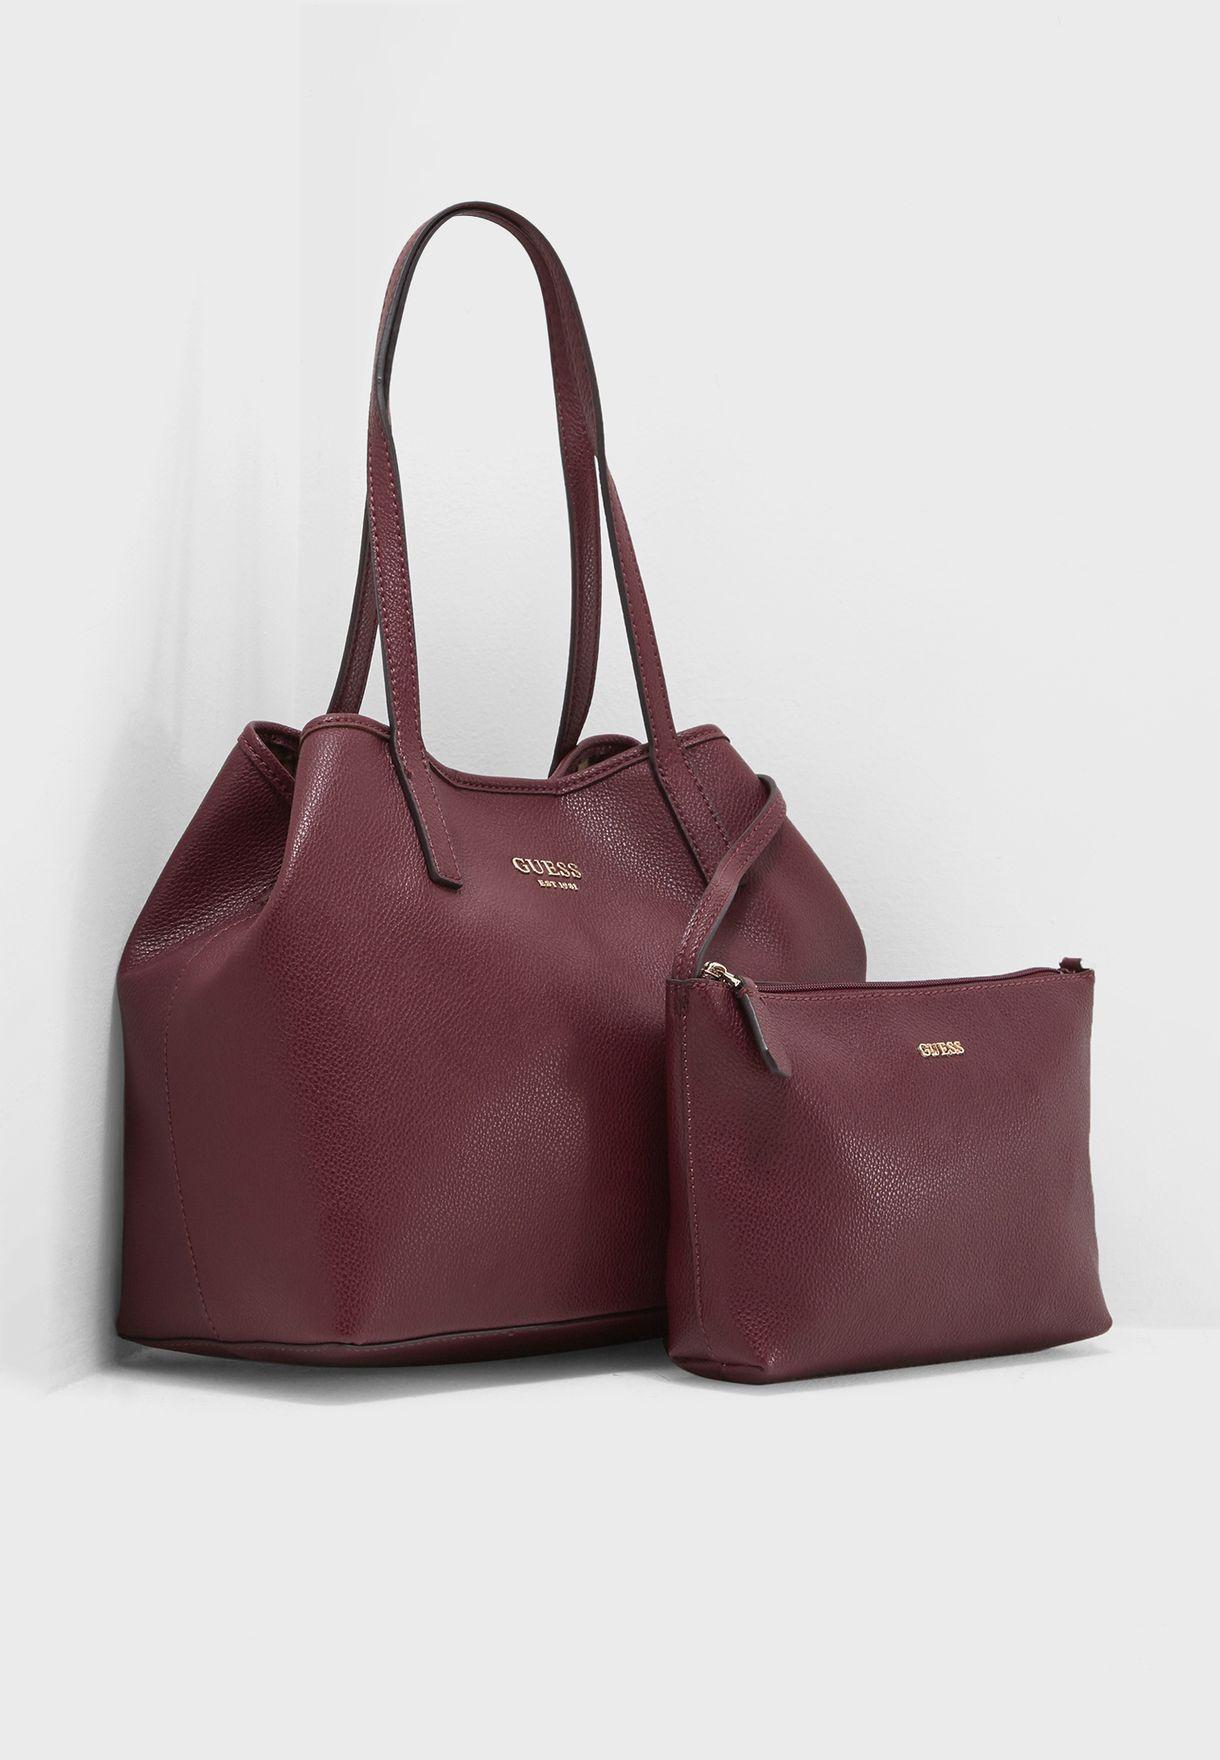 131e708d105 ... best service ede89 eb882 Shop Guess burgundy Vikky Tote VG699523BUR for  Women in Saud ...